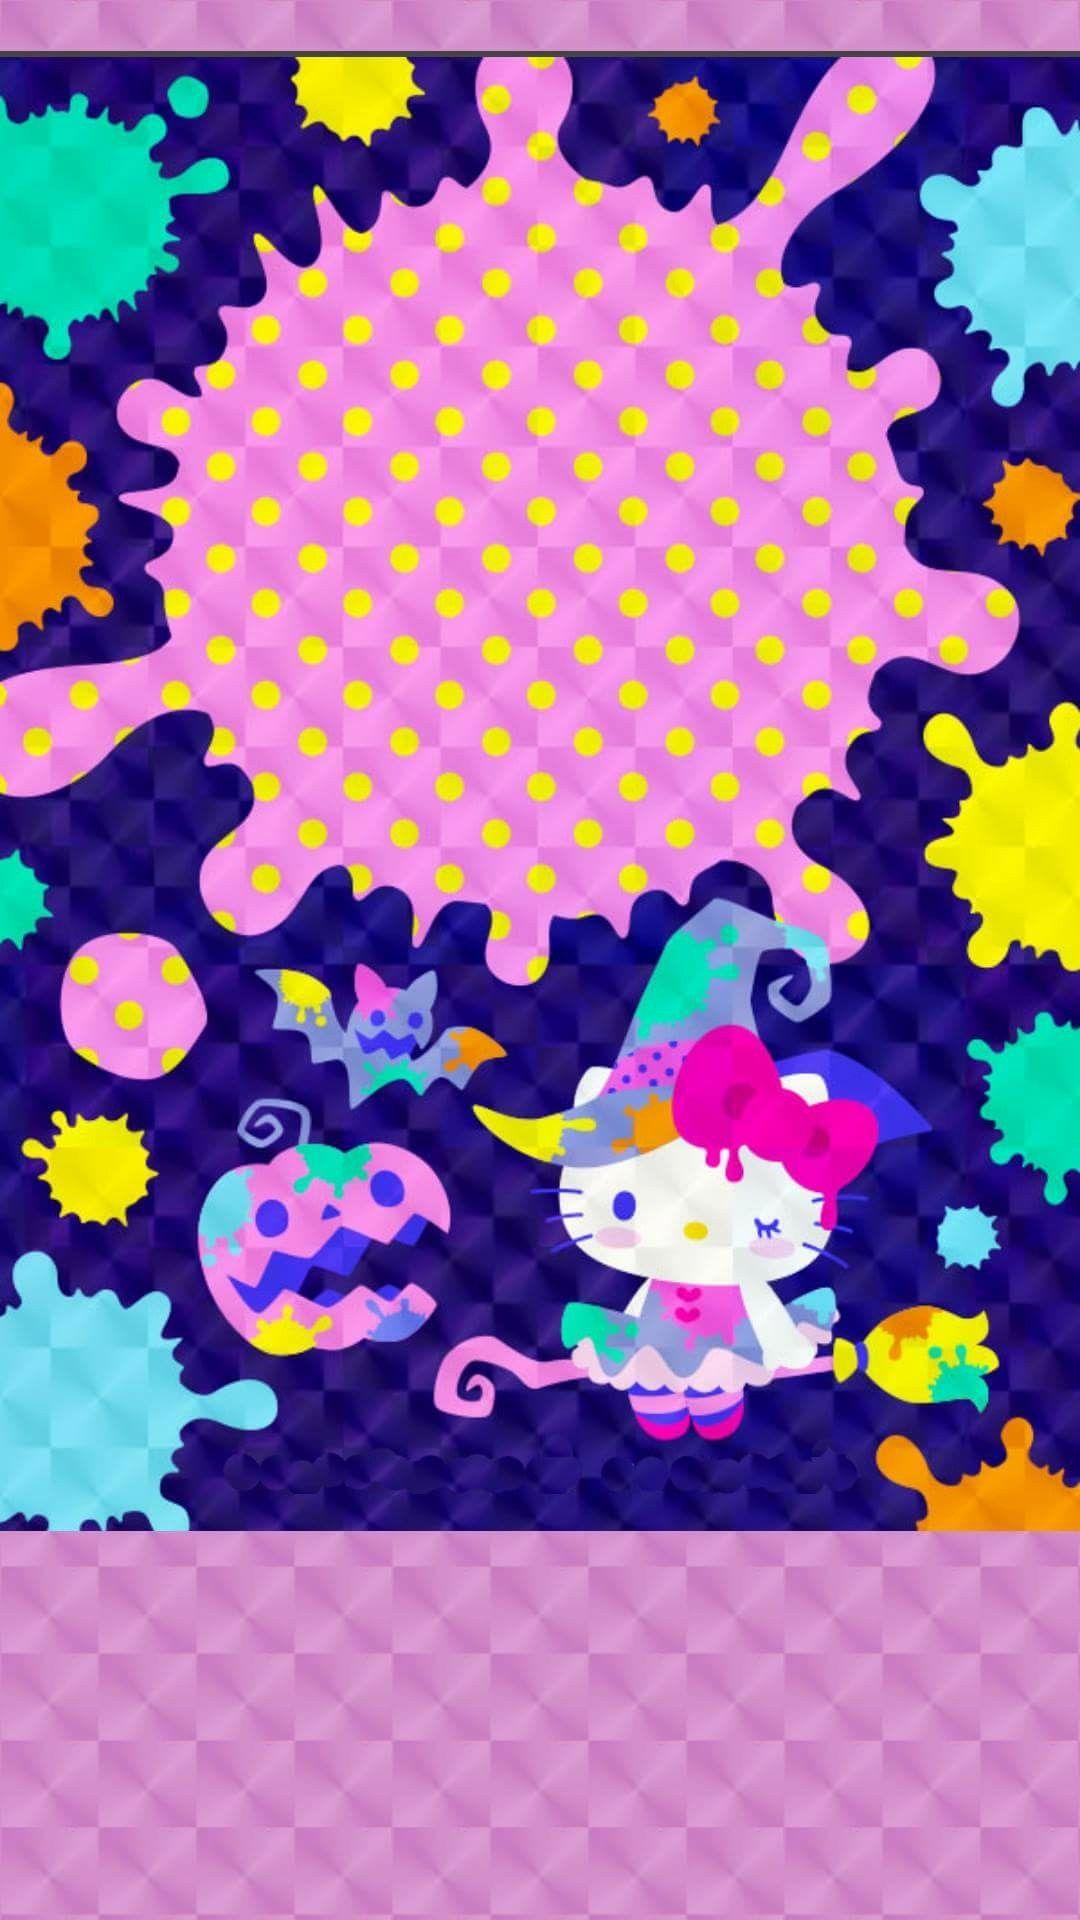 Most Inspiring Wallpaper Halloween Purple - ff186572d304256dad4ea4bb49109428  Graphic_672210.jpg